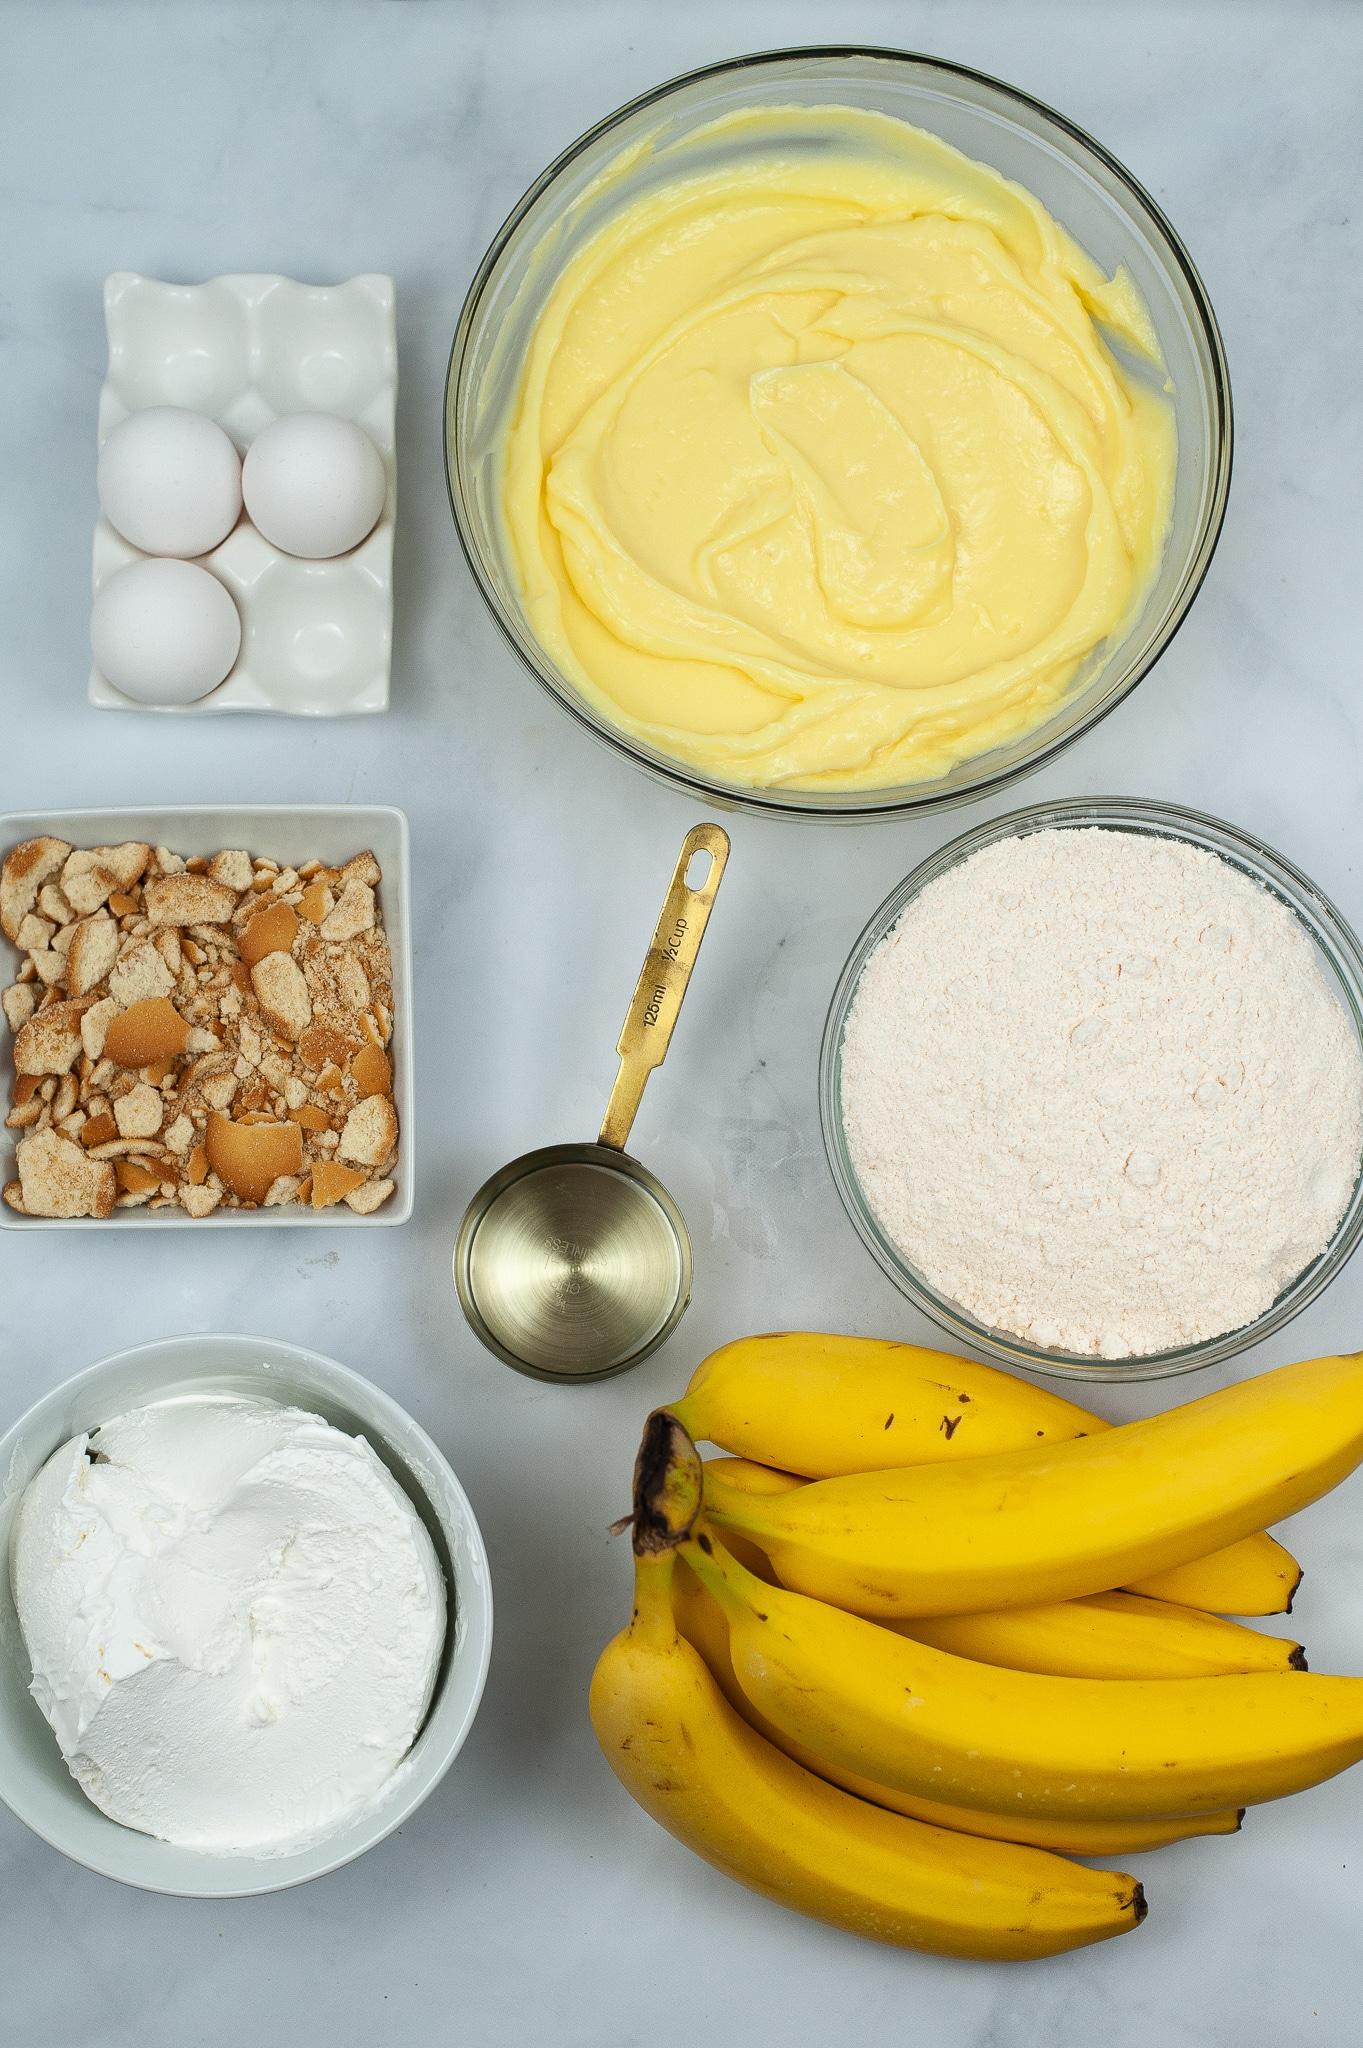 ingredients needed to make banana poke cake